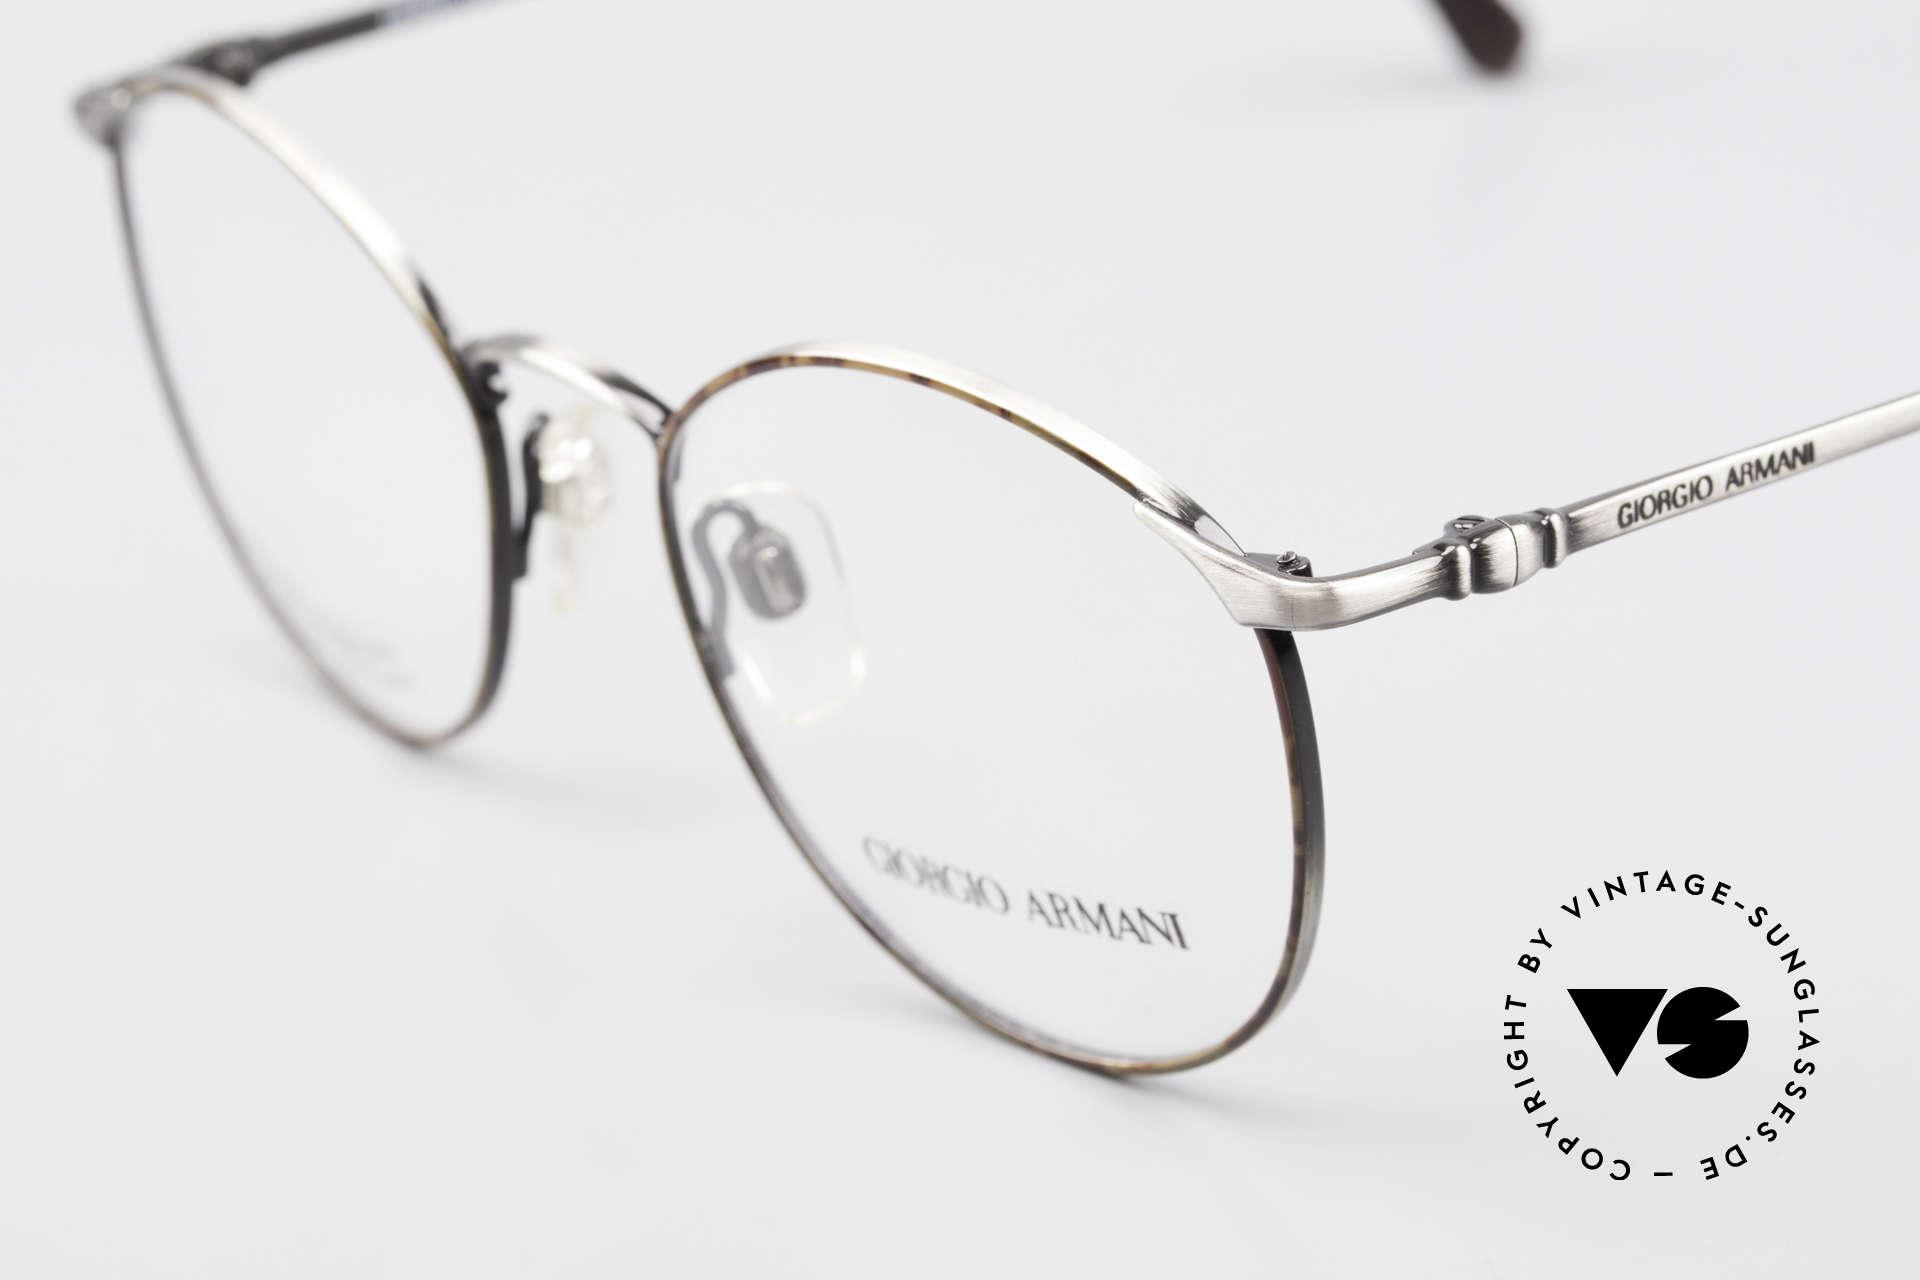 Giorgio Armani 132 Rare Old 90's Panto Eyeglasses, noble color combination of chestnut & antique-silver, Made for Men